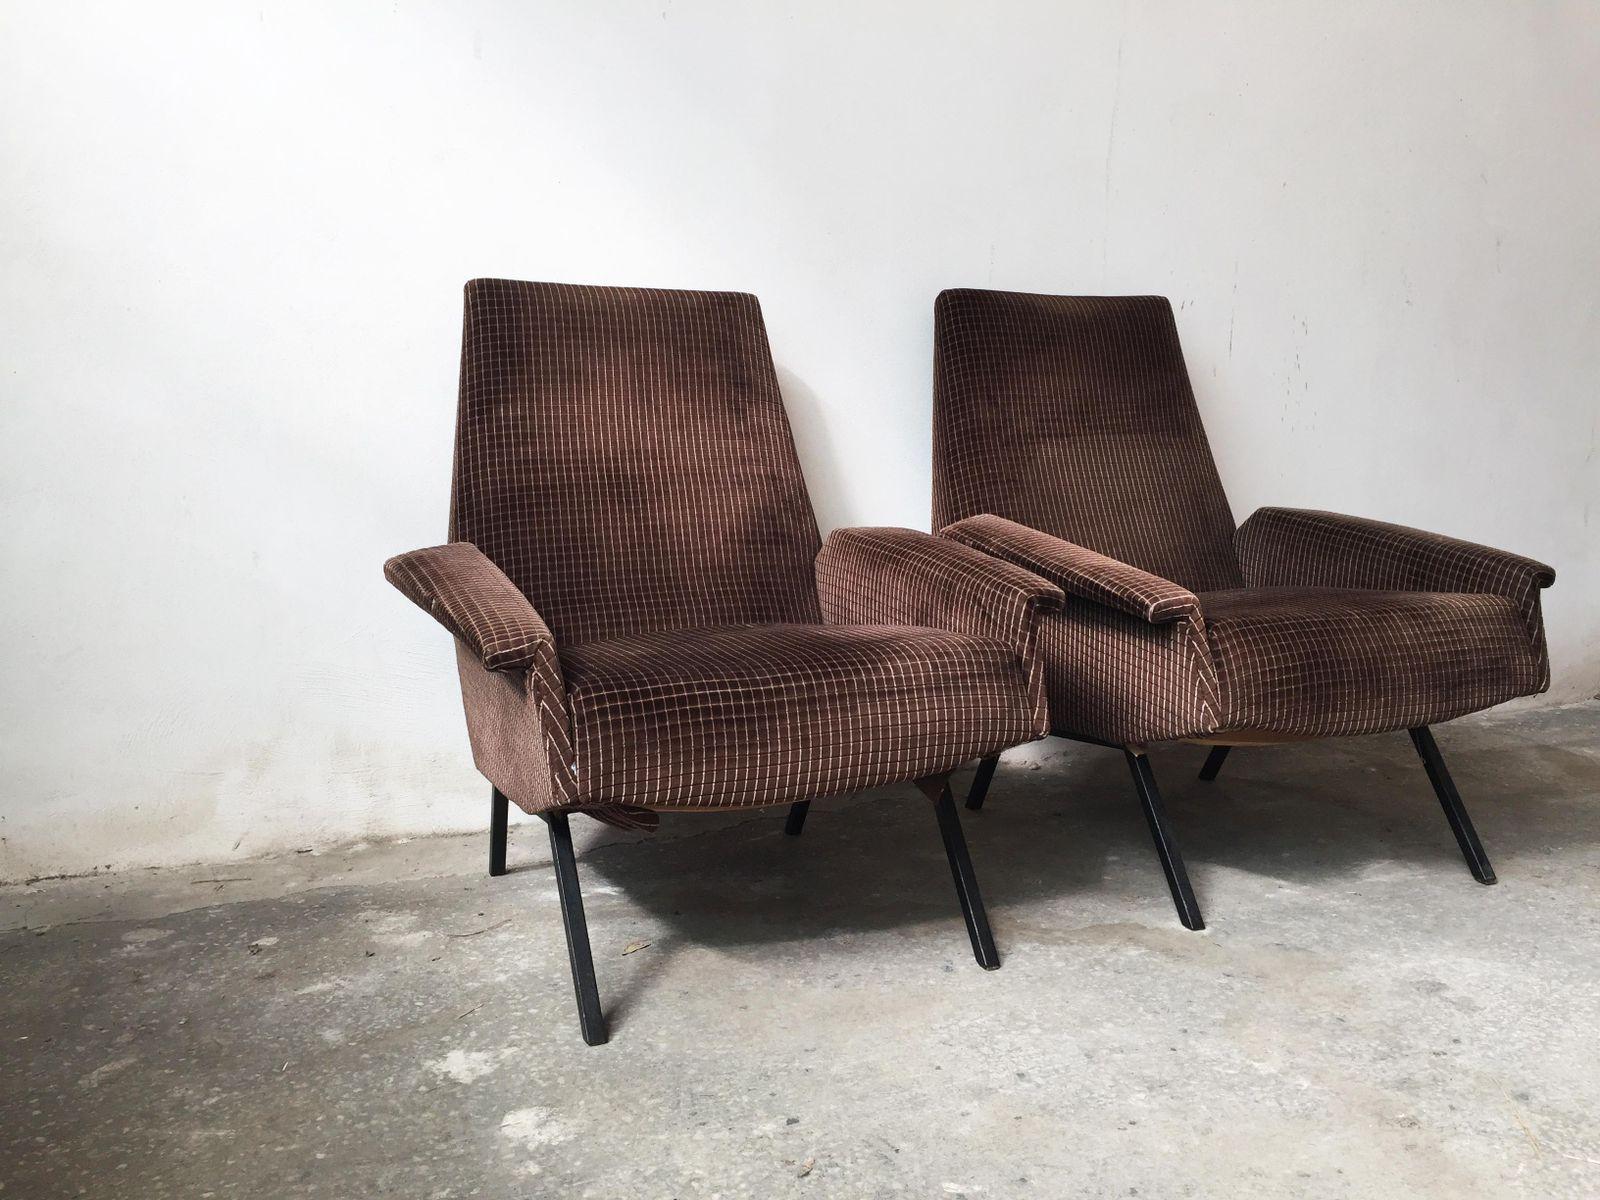 italienische mid century sessel 2er set bei pamono kaufen. Black Bedroom Furniture Sets. Home Design Ideas